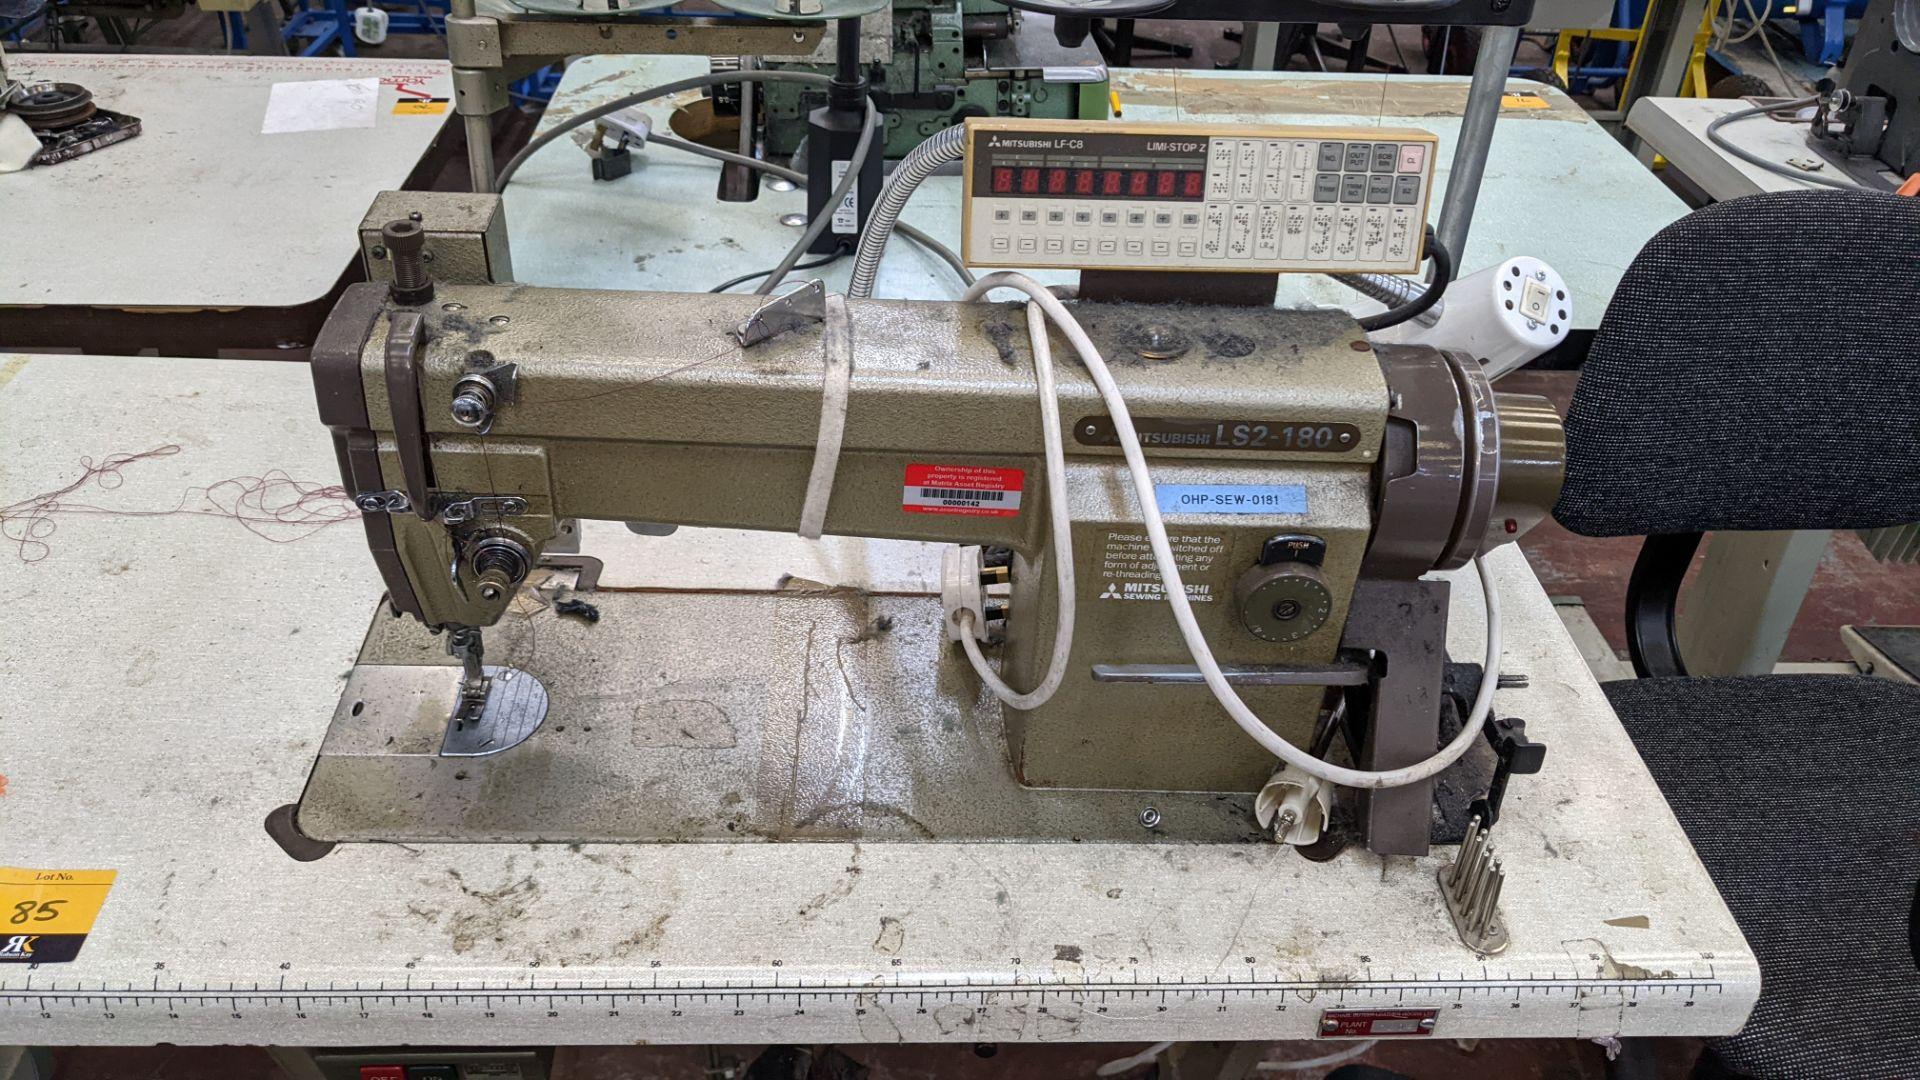 Mitsubishi LS2-180 sewing machine with Mitsubishi LF-C8 digital controller - Image 5 of 12